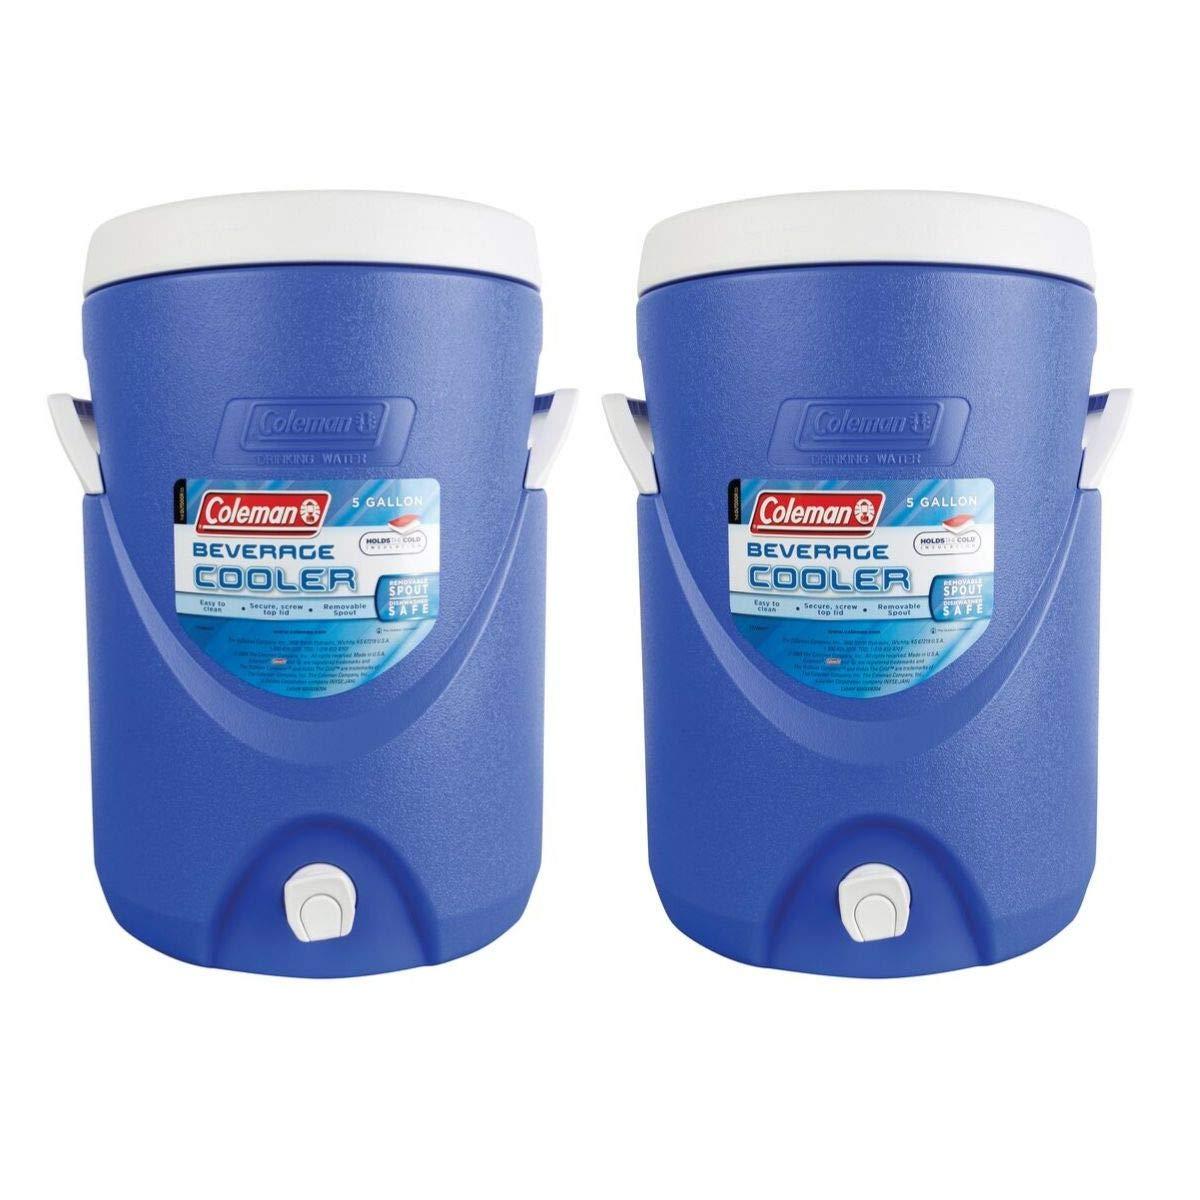 Coleman 5-Gallon Team Cooler (Blue/Set of 2) by Coleman